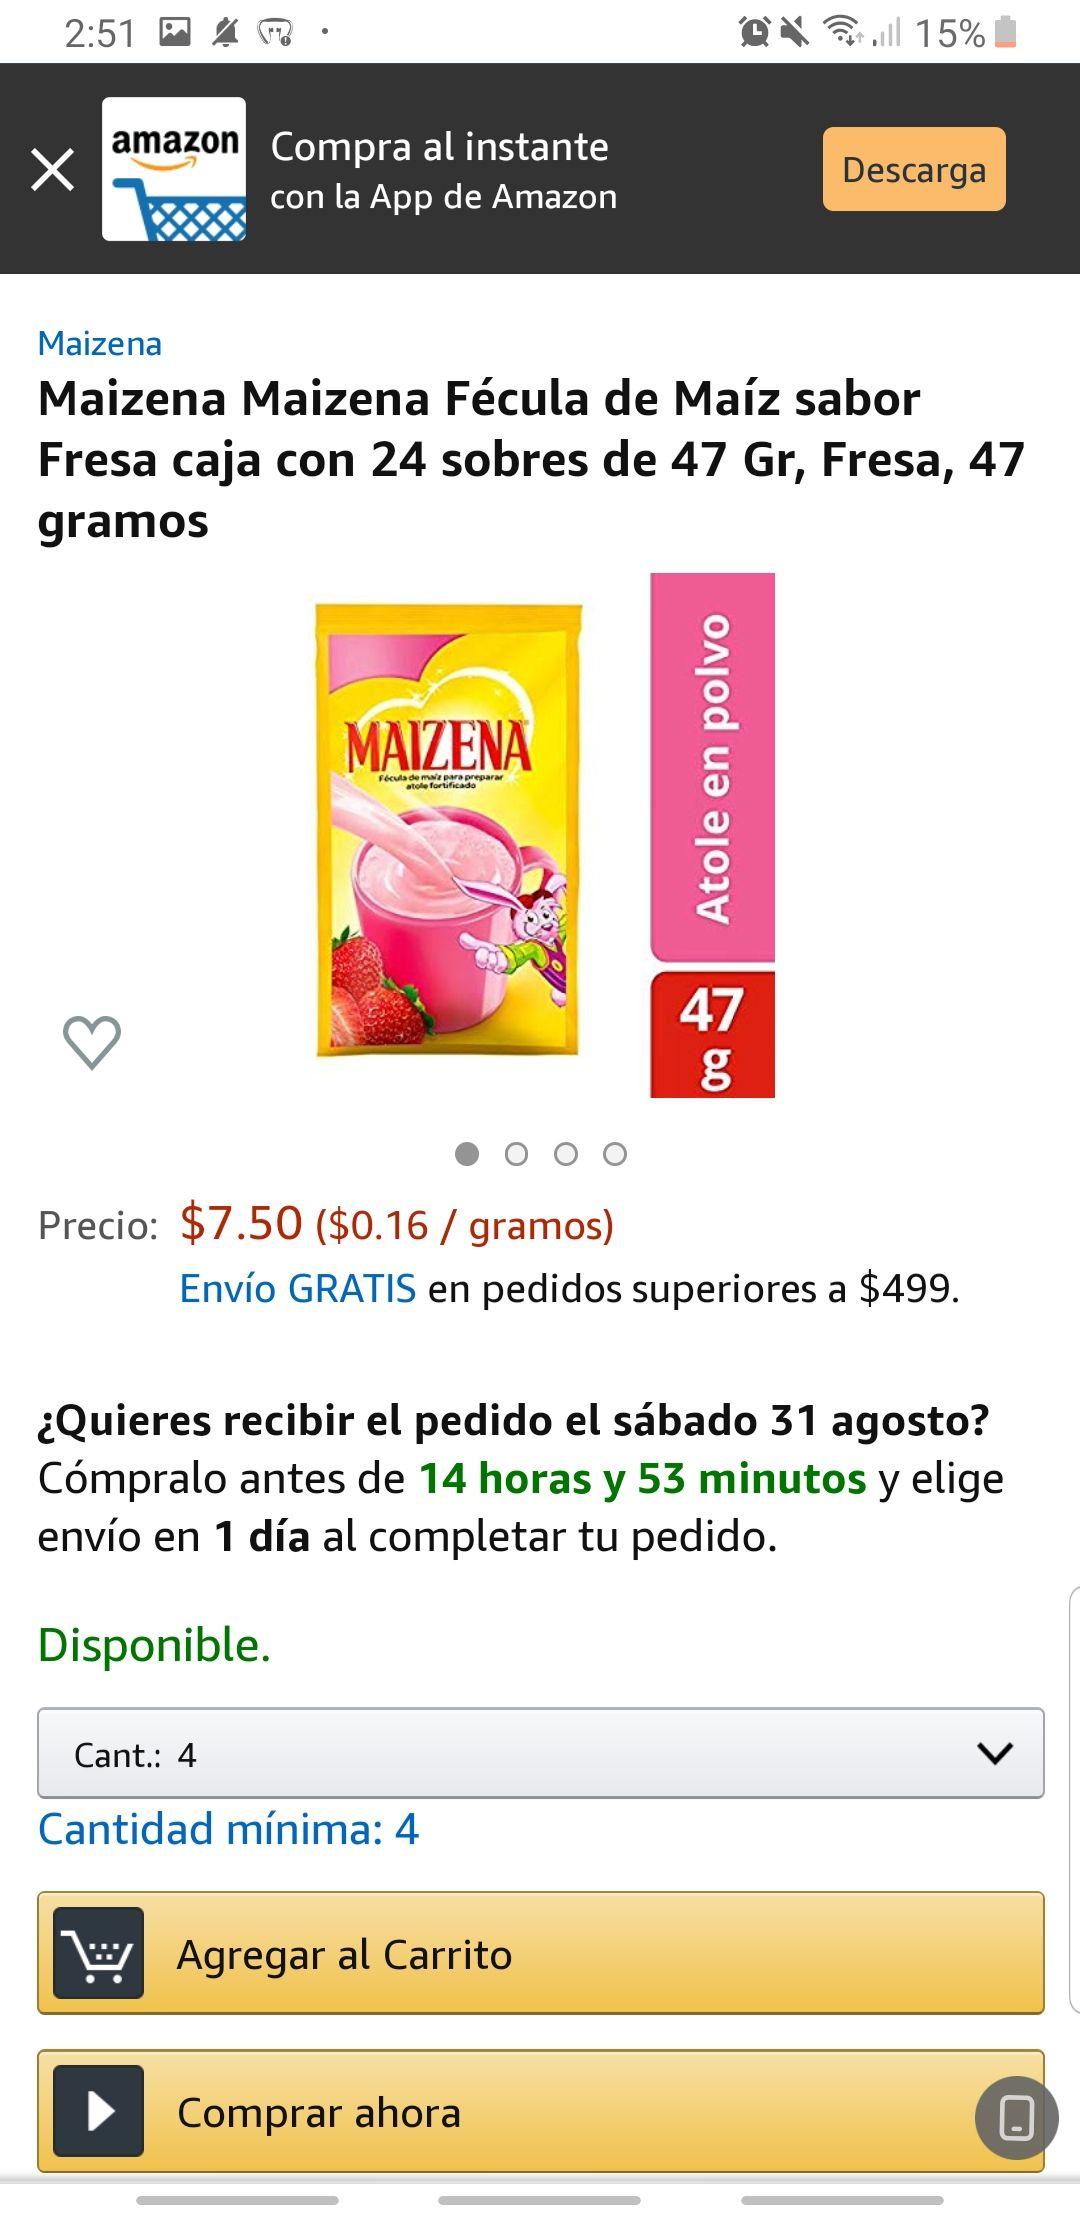 Amazon: caja de 24 sobres de maizena